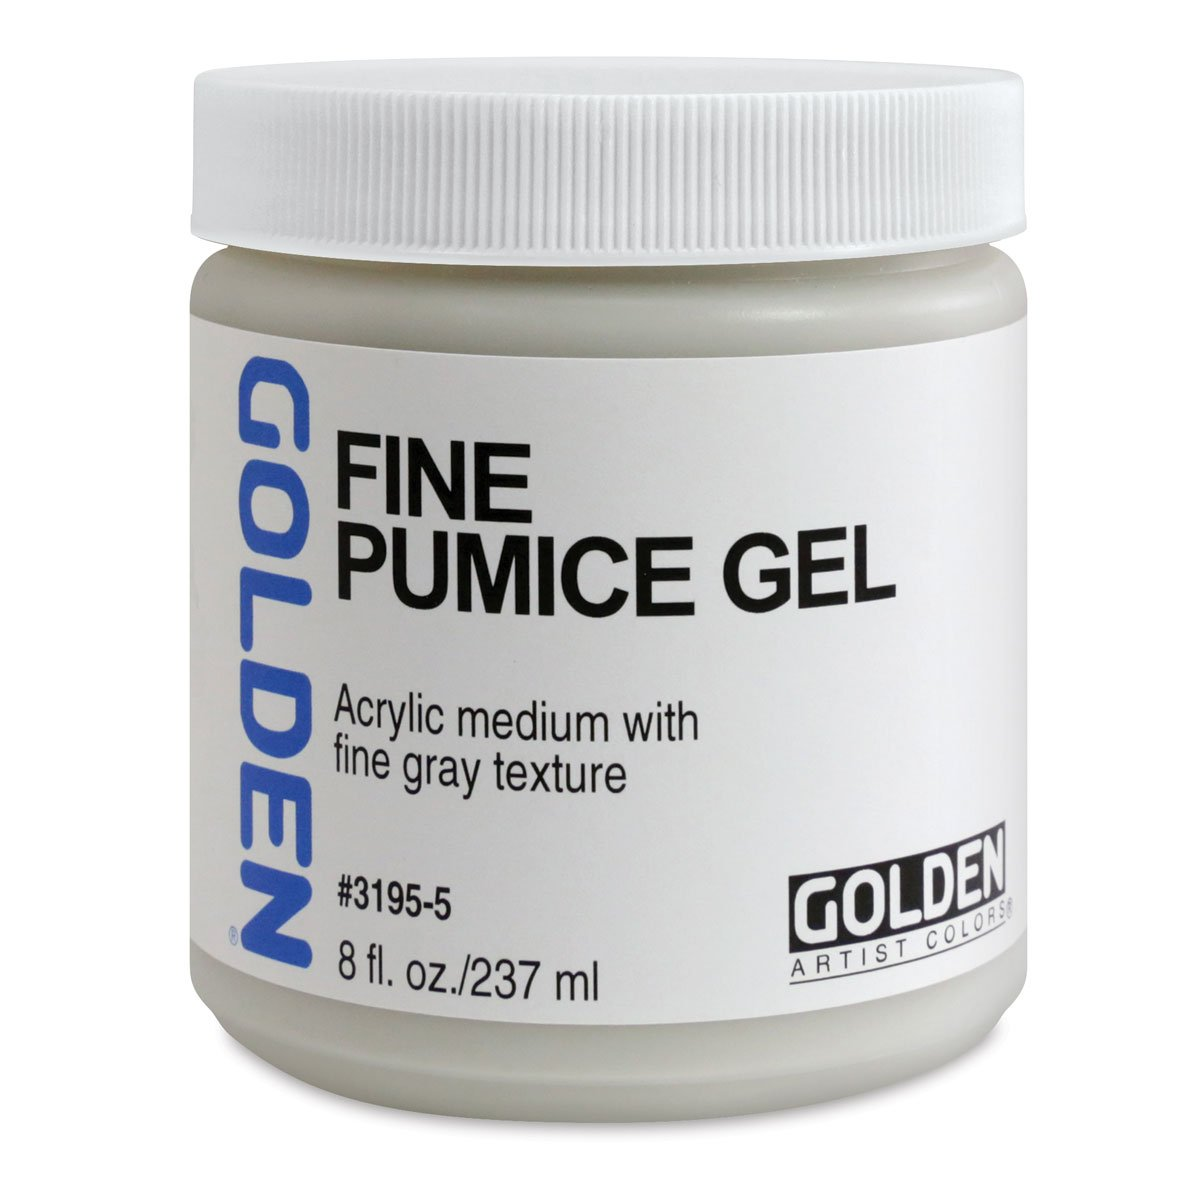 Golden Gel Mediums: Fine Pumice Gel